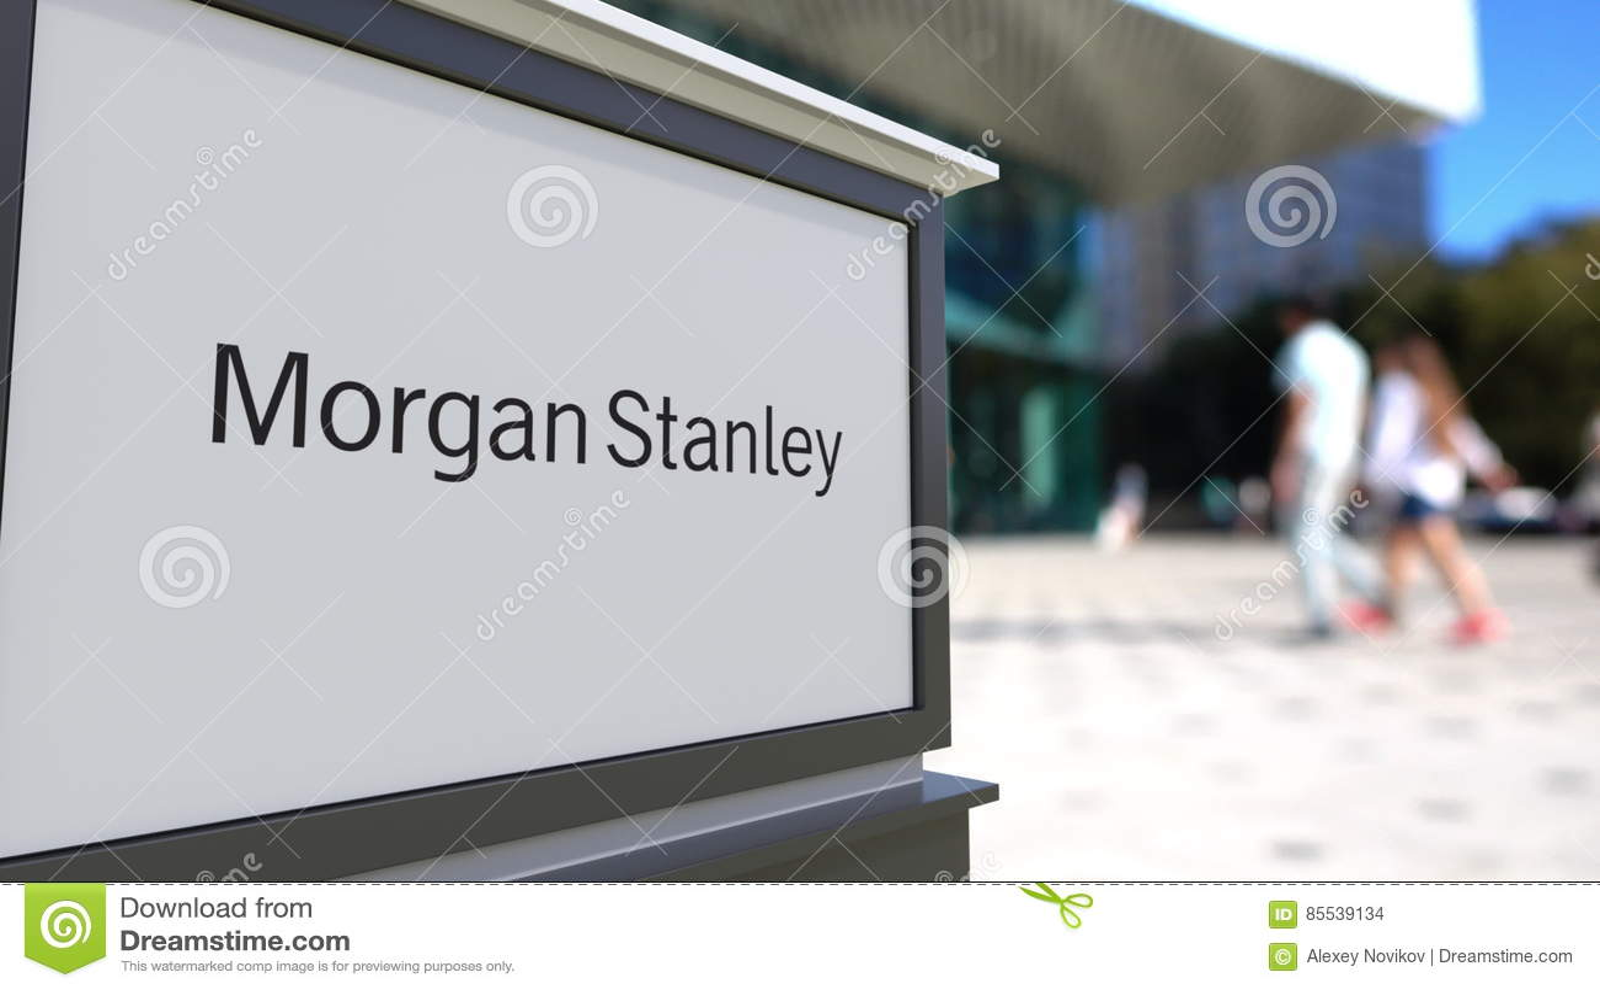 Street Signage Board With Morgan Stanley Inc  Logo  Blurred